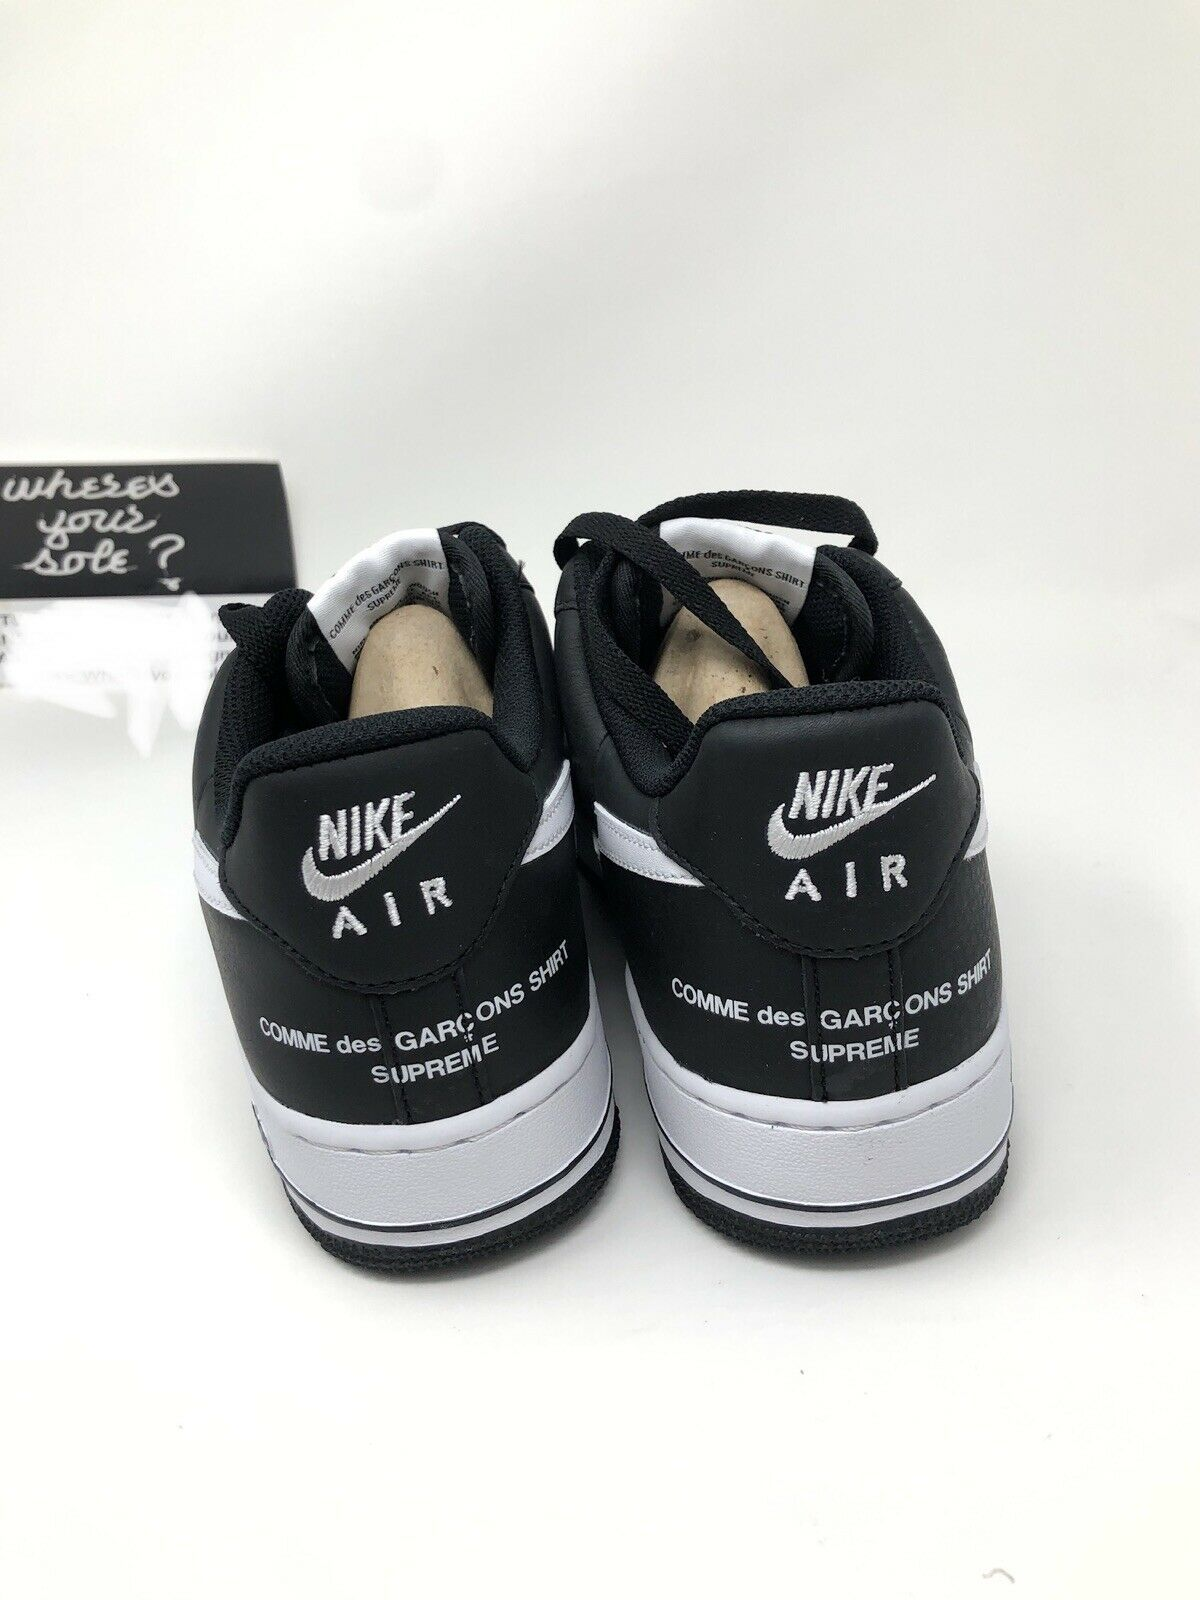 865715f5e978bb ... Nike Supreme Supreme Supreme CDG Comme Des Garcons Air Force 1 Low  Black size 8.5 New ...